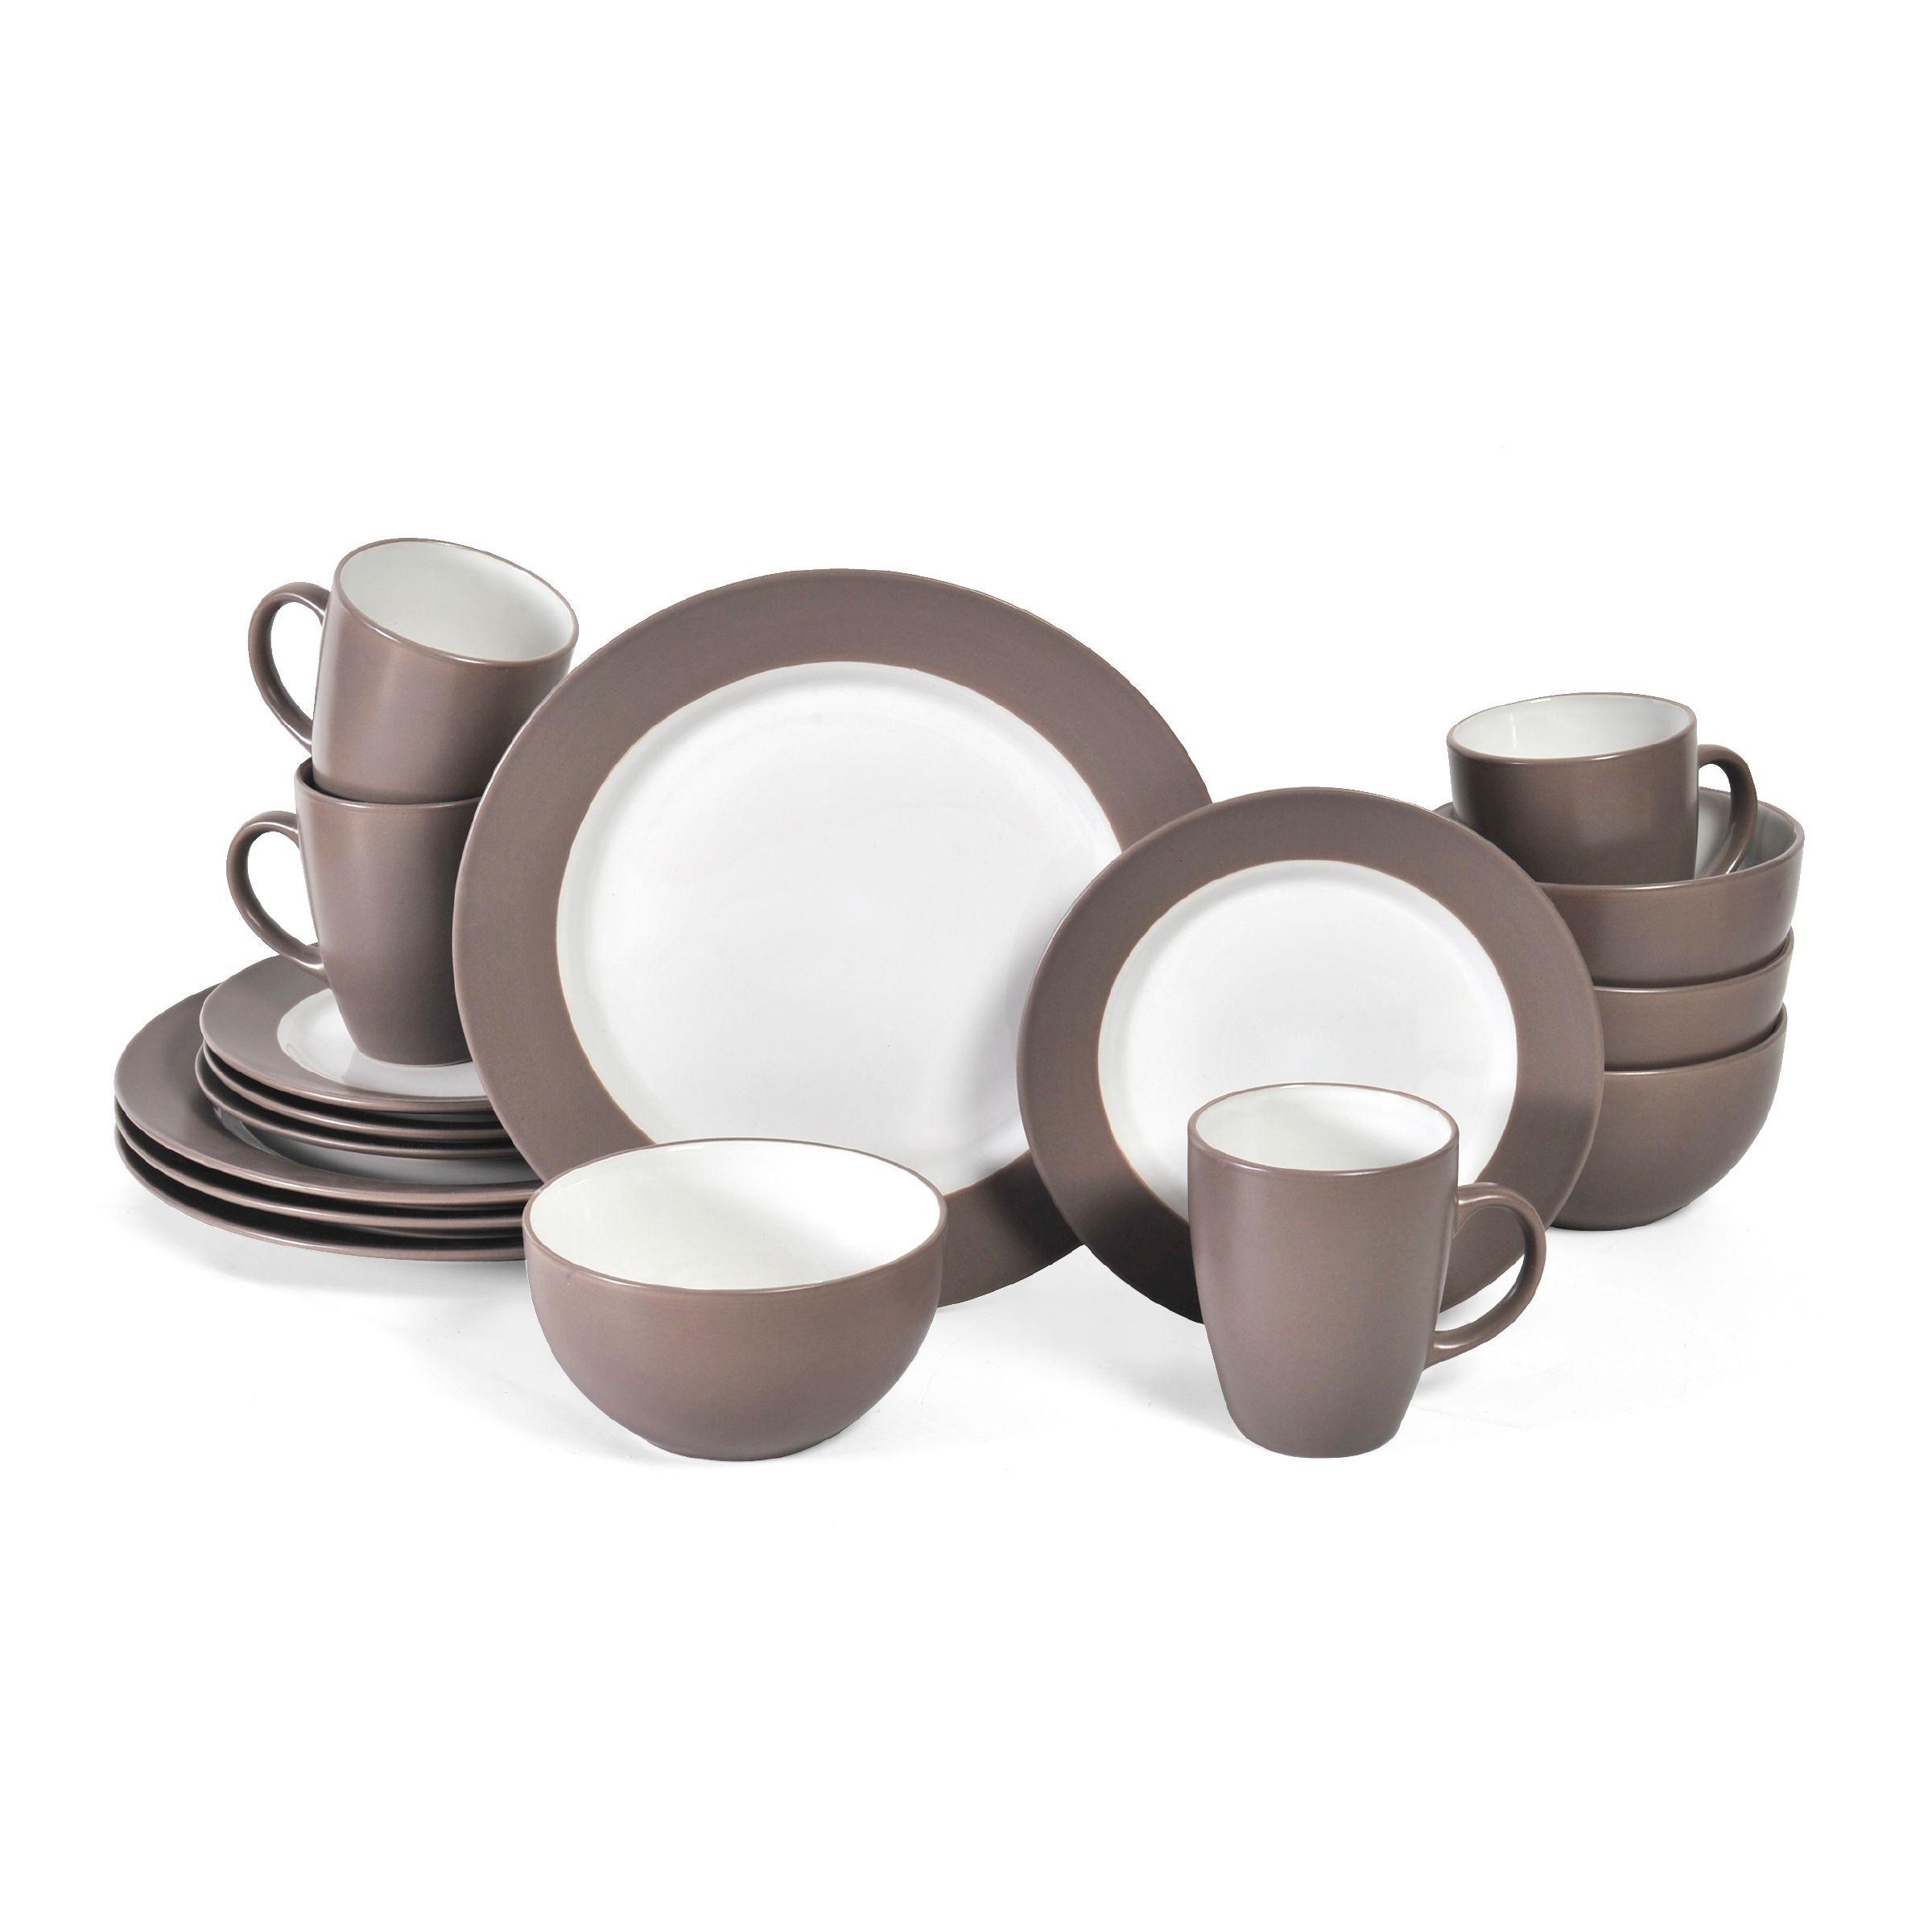 Pfaltzgraff Everyday Harmony Taupe Stoneware 16-piece Dinnerware Set (Service for 4) (  sc 1 st  Pinterest & Pfaltzgraff Everyday Harmony Taupe Stoneware 16-piece Dinnerware Set ...